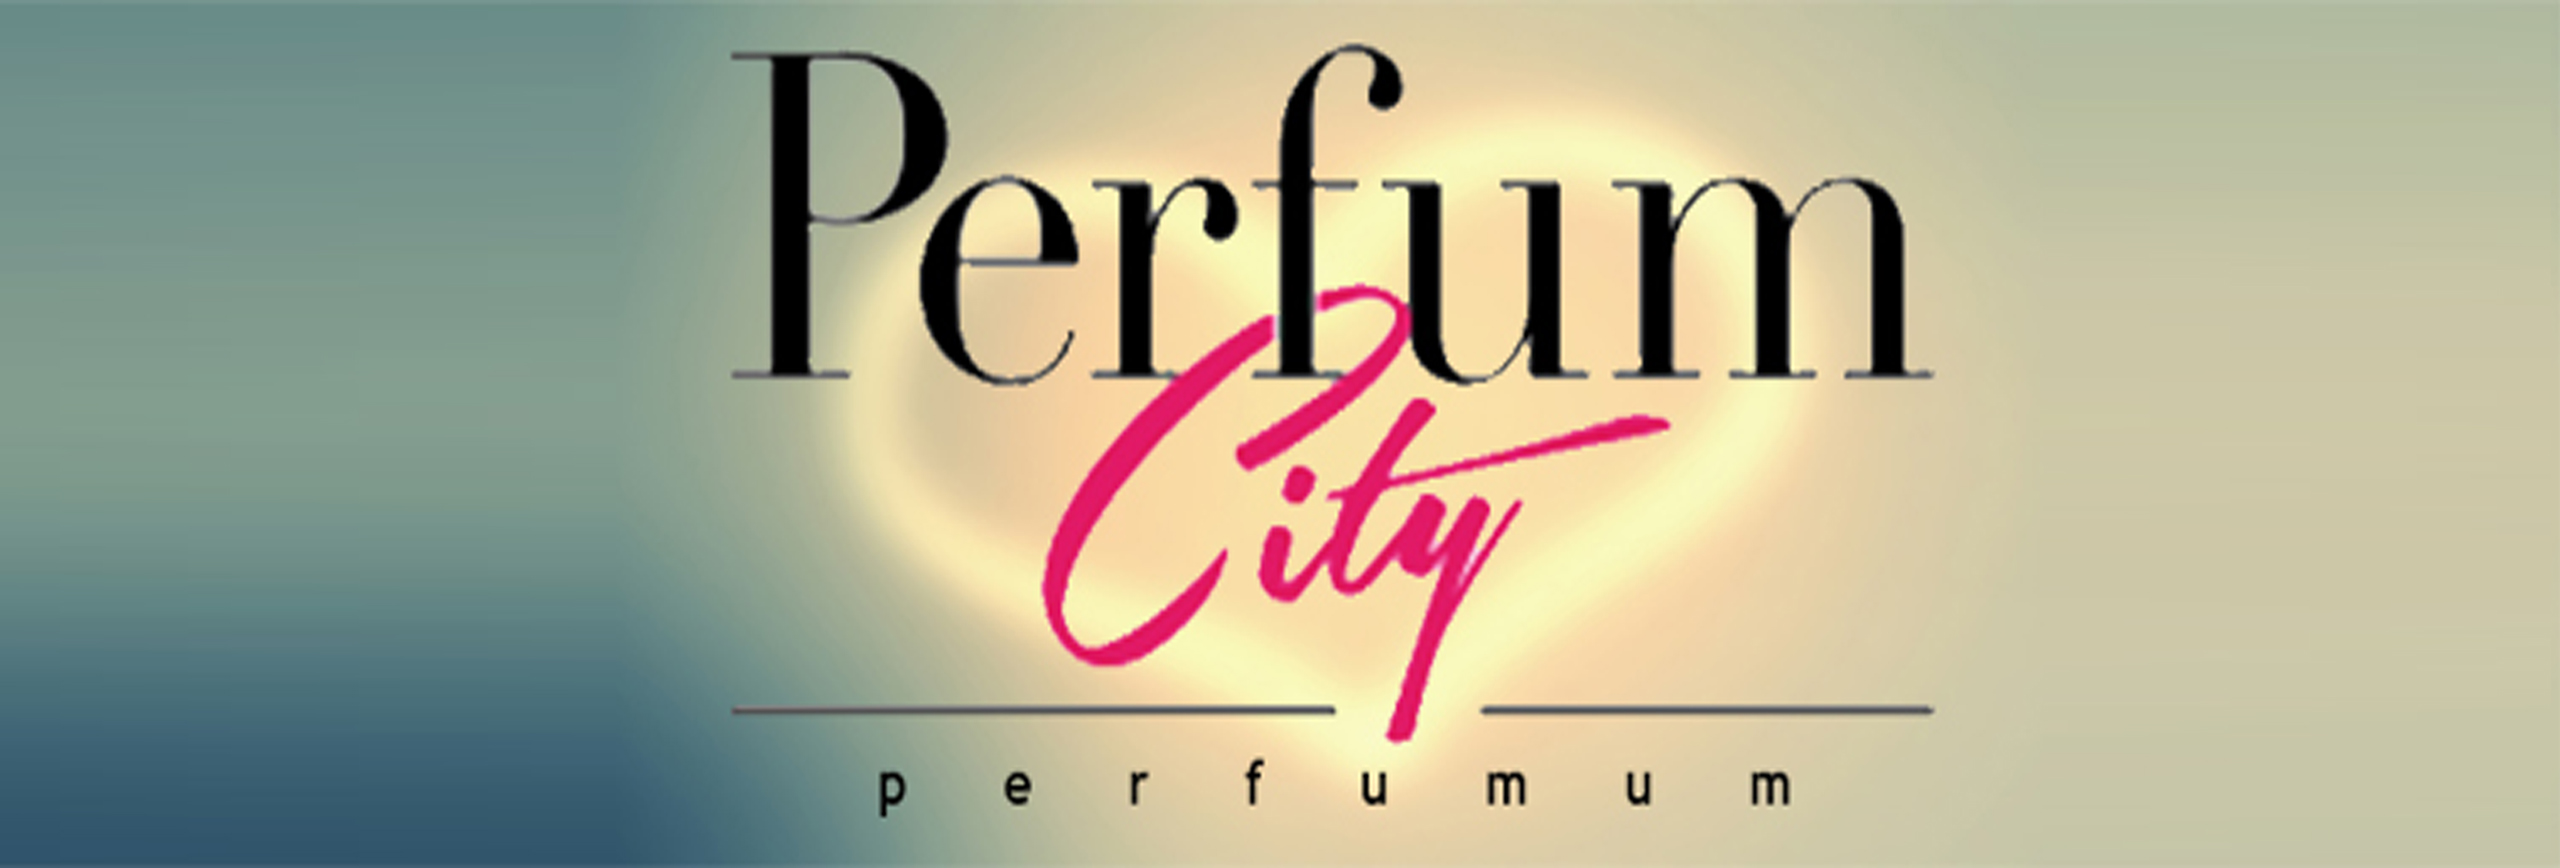 perfumcity-kalp